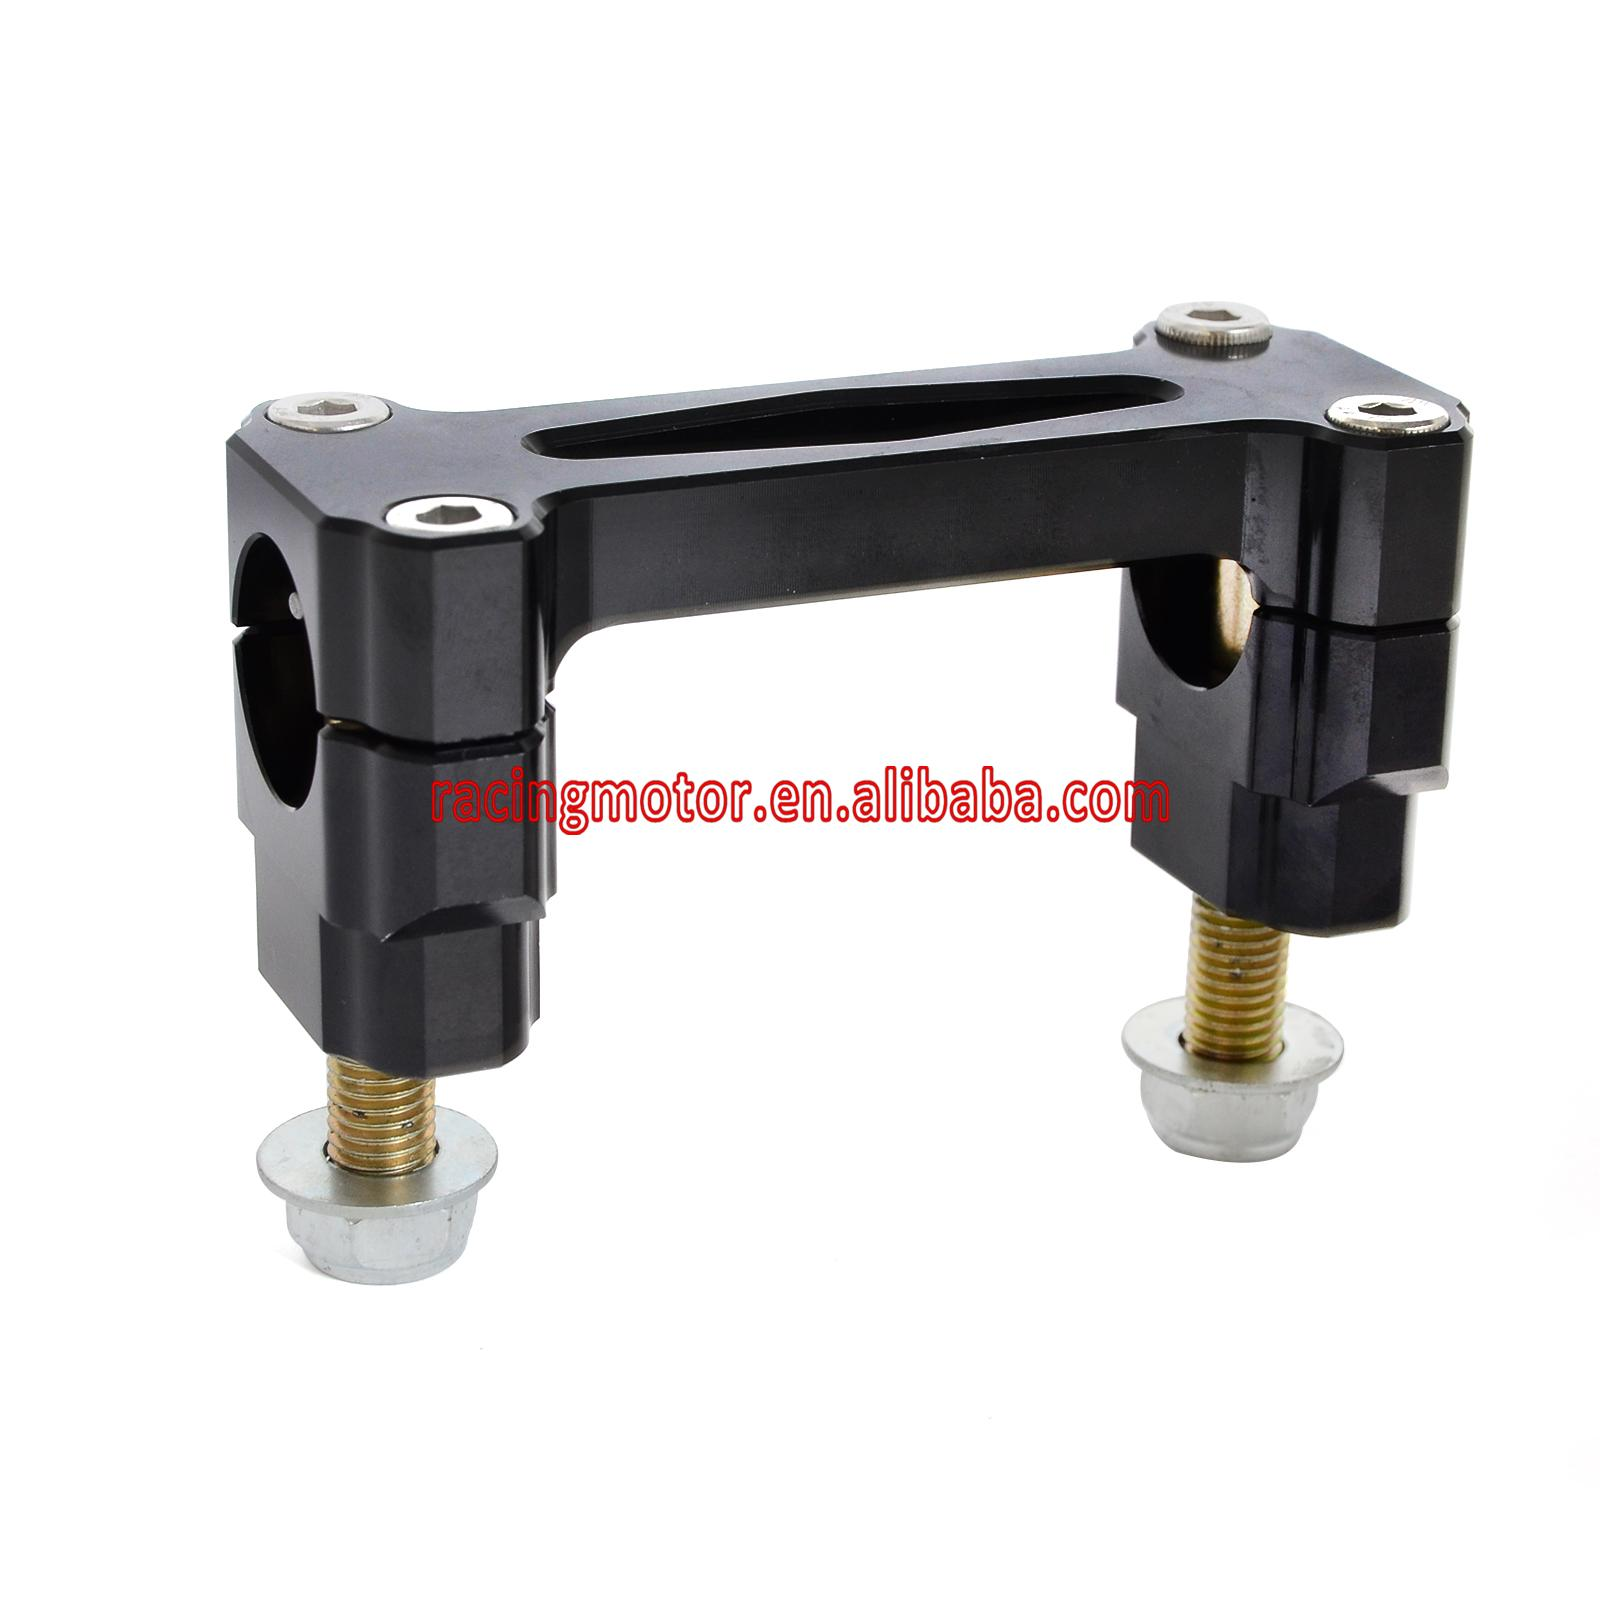 Bar Risers Mounts Handlebar Clamp Kit for Honda CR125R CR250R 00-07 CRF250R CRF250X 04-16 CRF450R 02-16 CRF450X 05-16